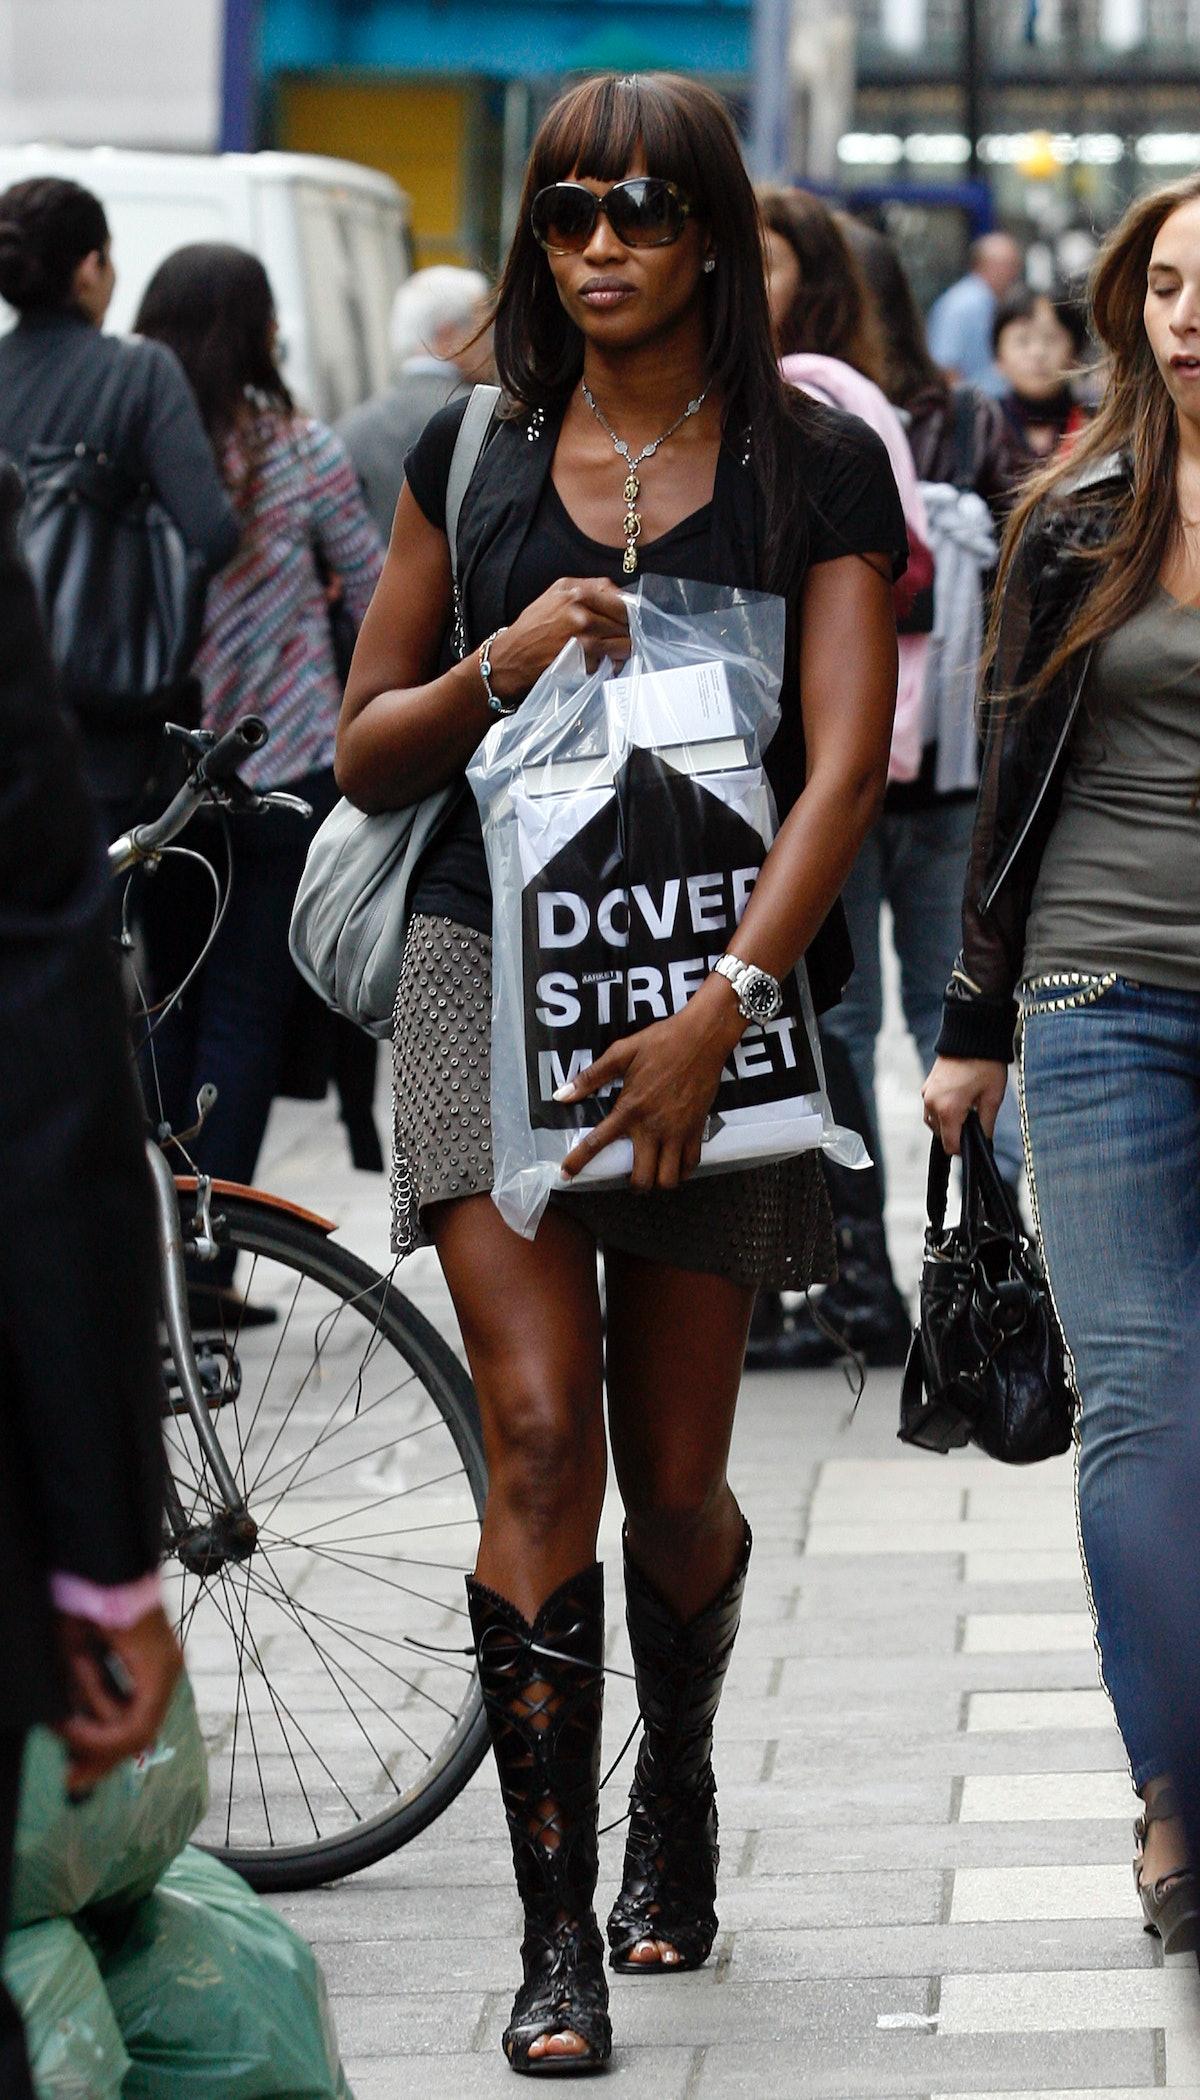 Naomi Campbell Sighting in London - September 21, 2009